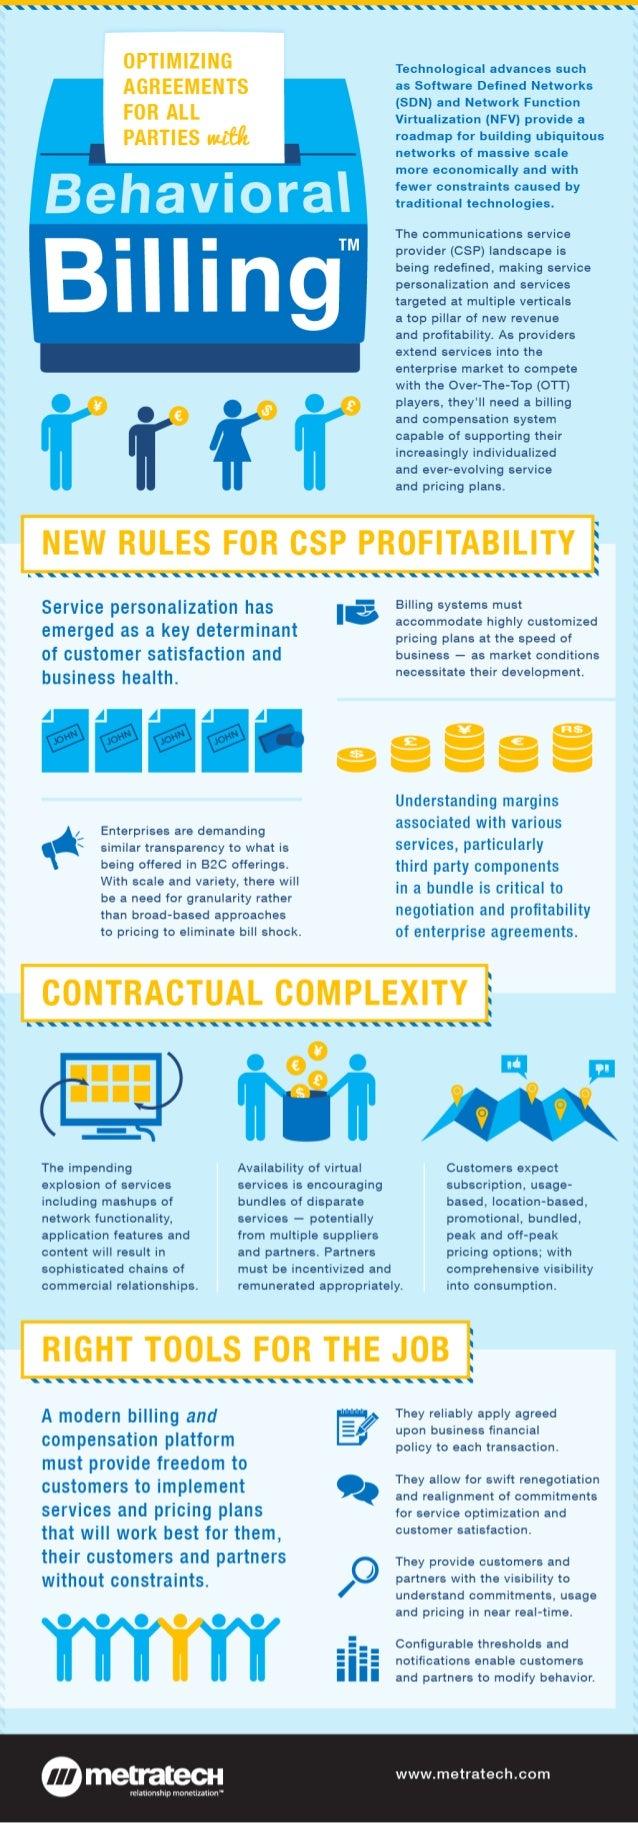 The Emerging Importance of Behavioral Billing™